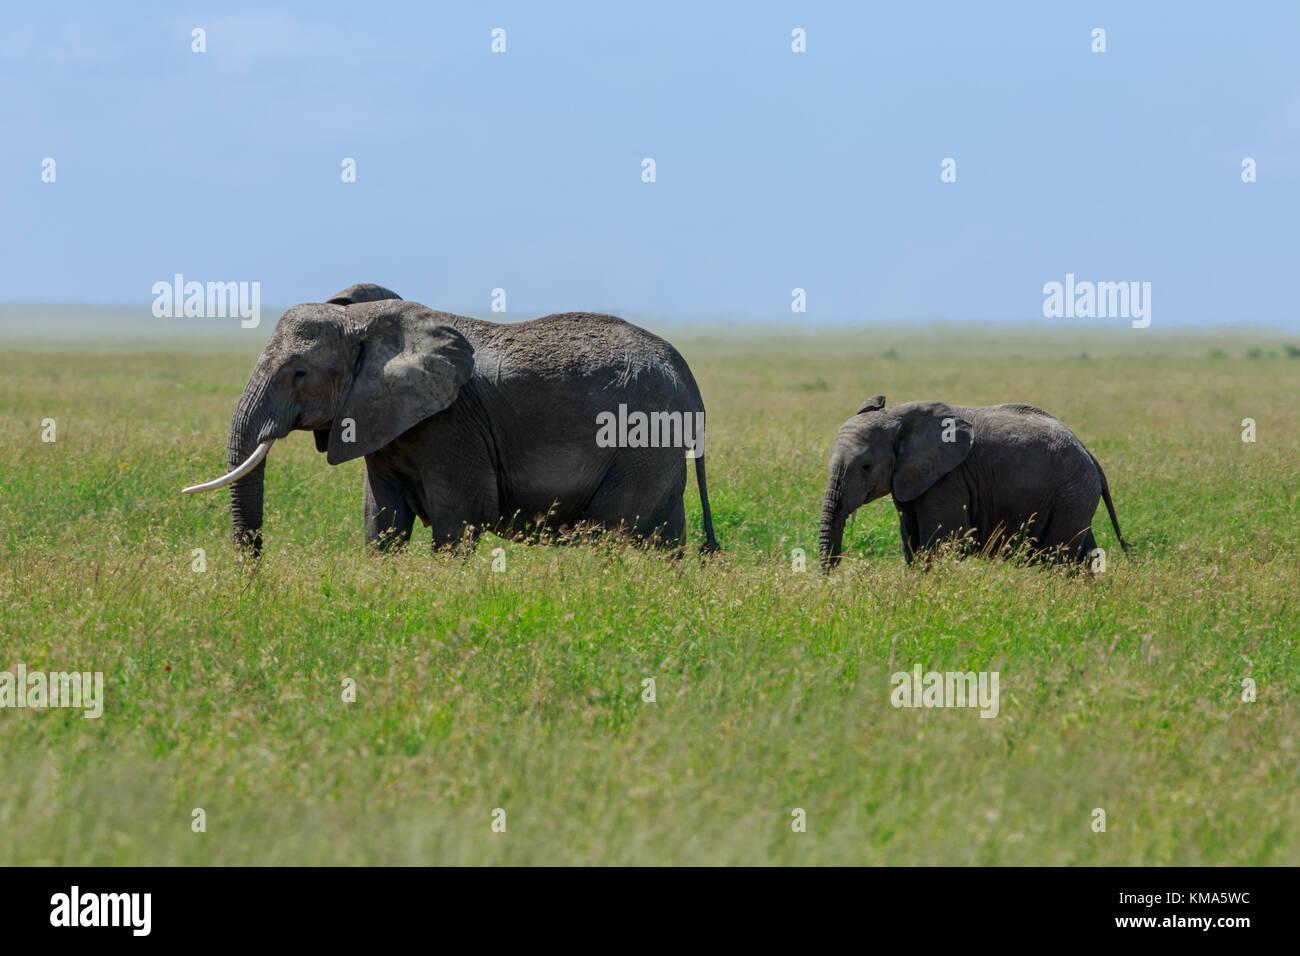 Madre elefante africano con un ternero Foto de stock